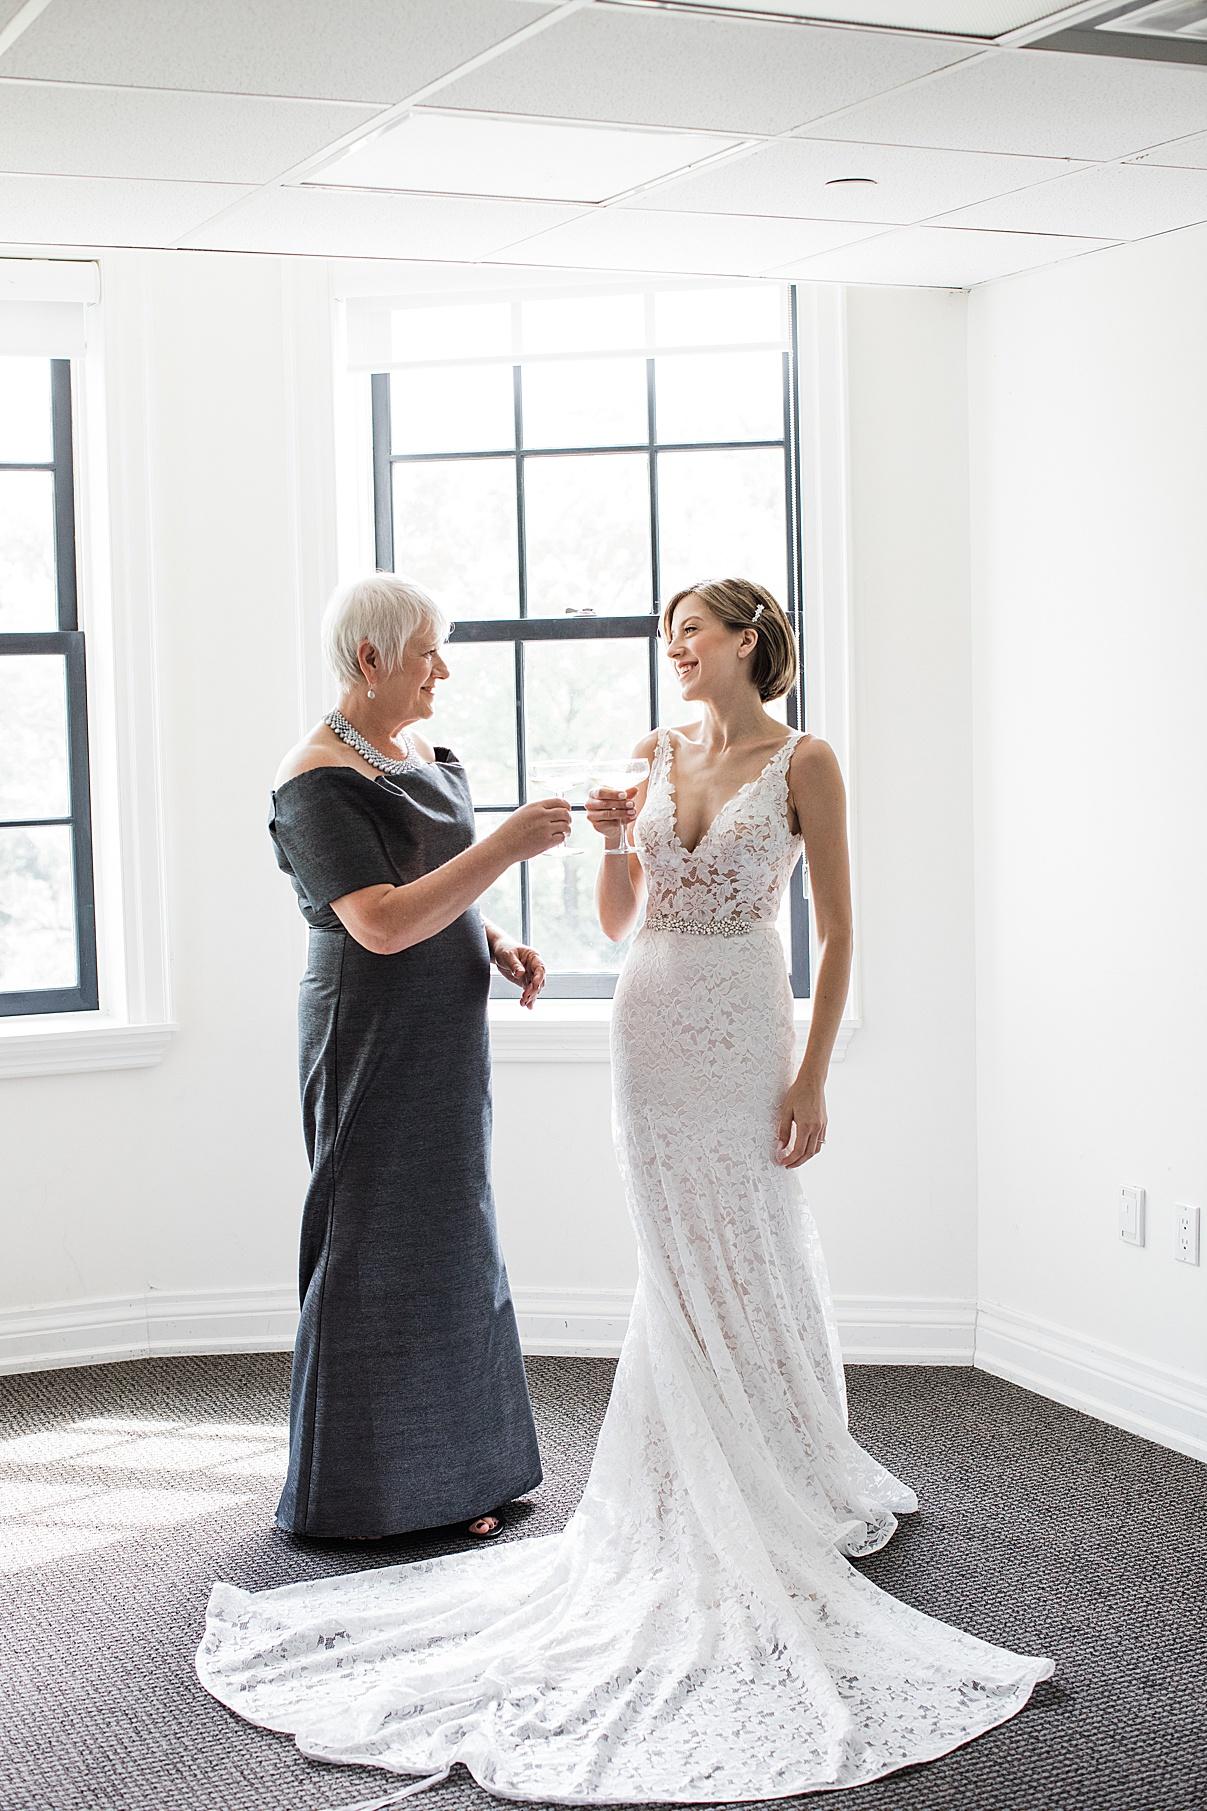 Bride toasting with her mom| Harding Waterfront Estate Wedding| Ontario wedding photographer| Toronto wedding photographer| 3 Photography | 3photography.ca